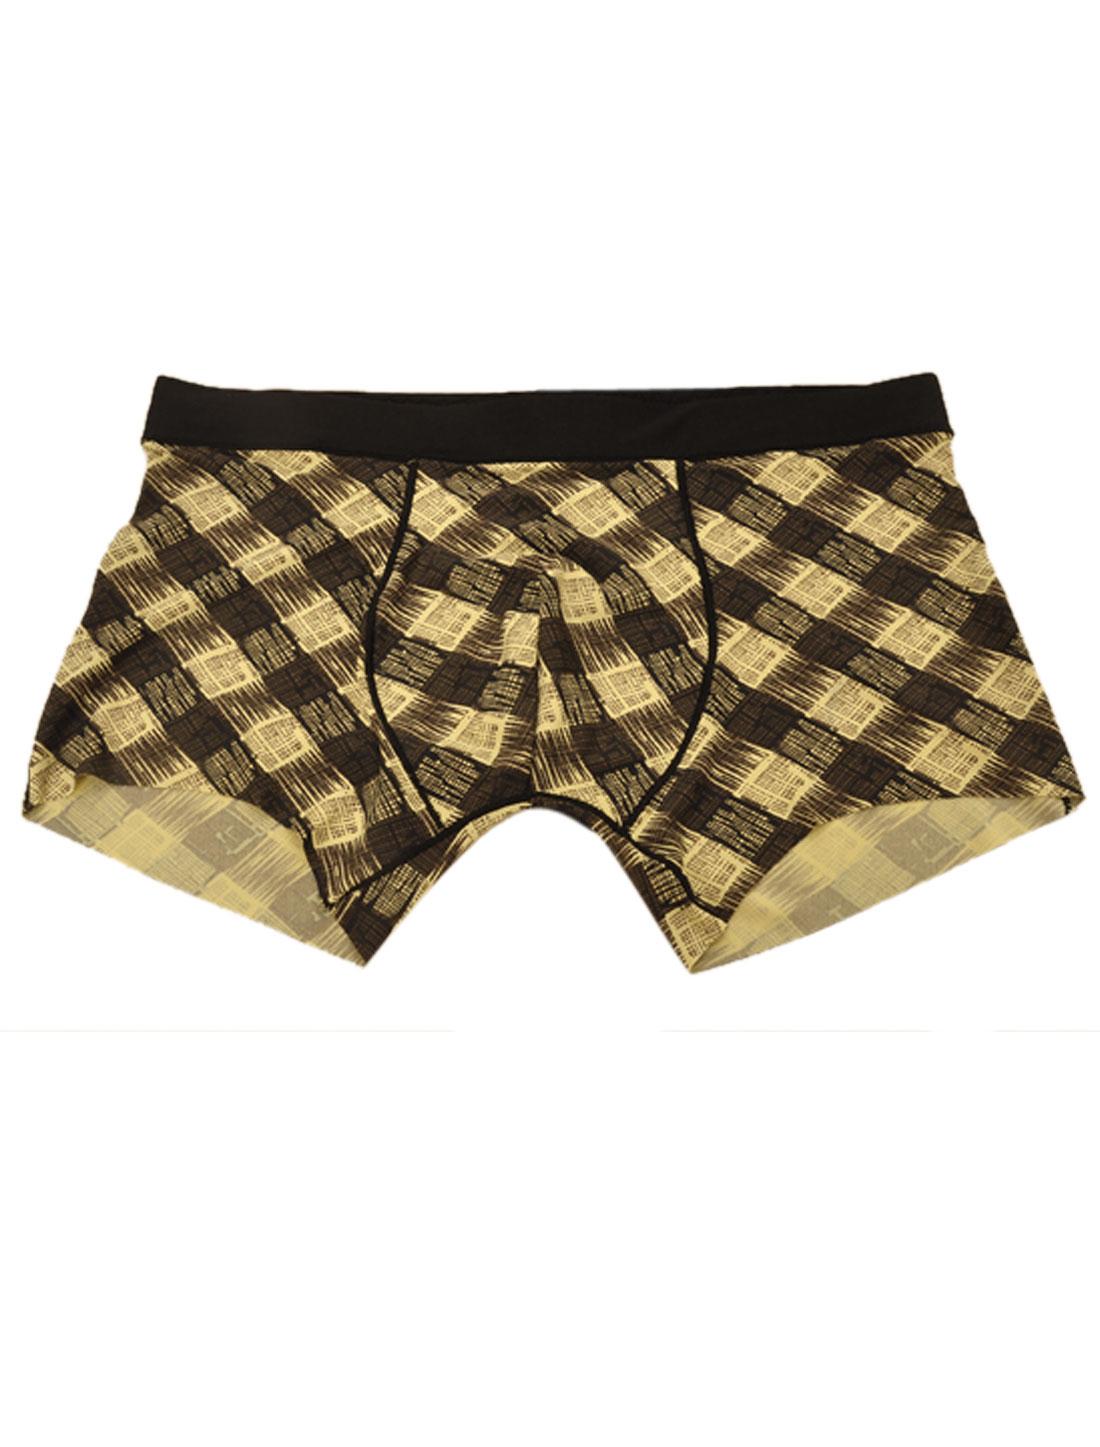 Men Stretchy Waist Plaids Pattern Boxer Brief Yellow Black W30